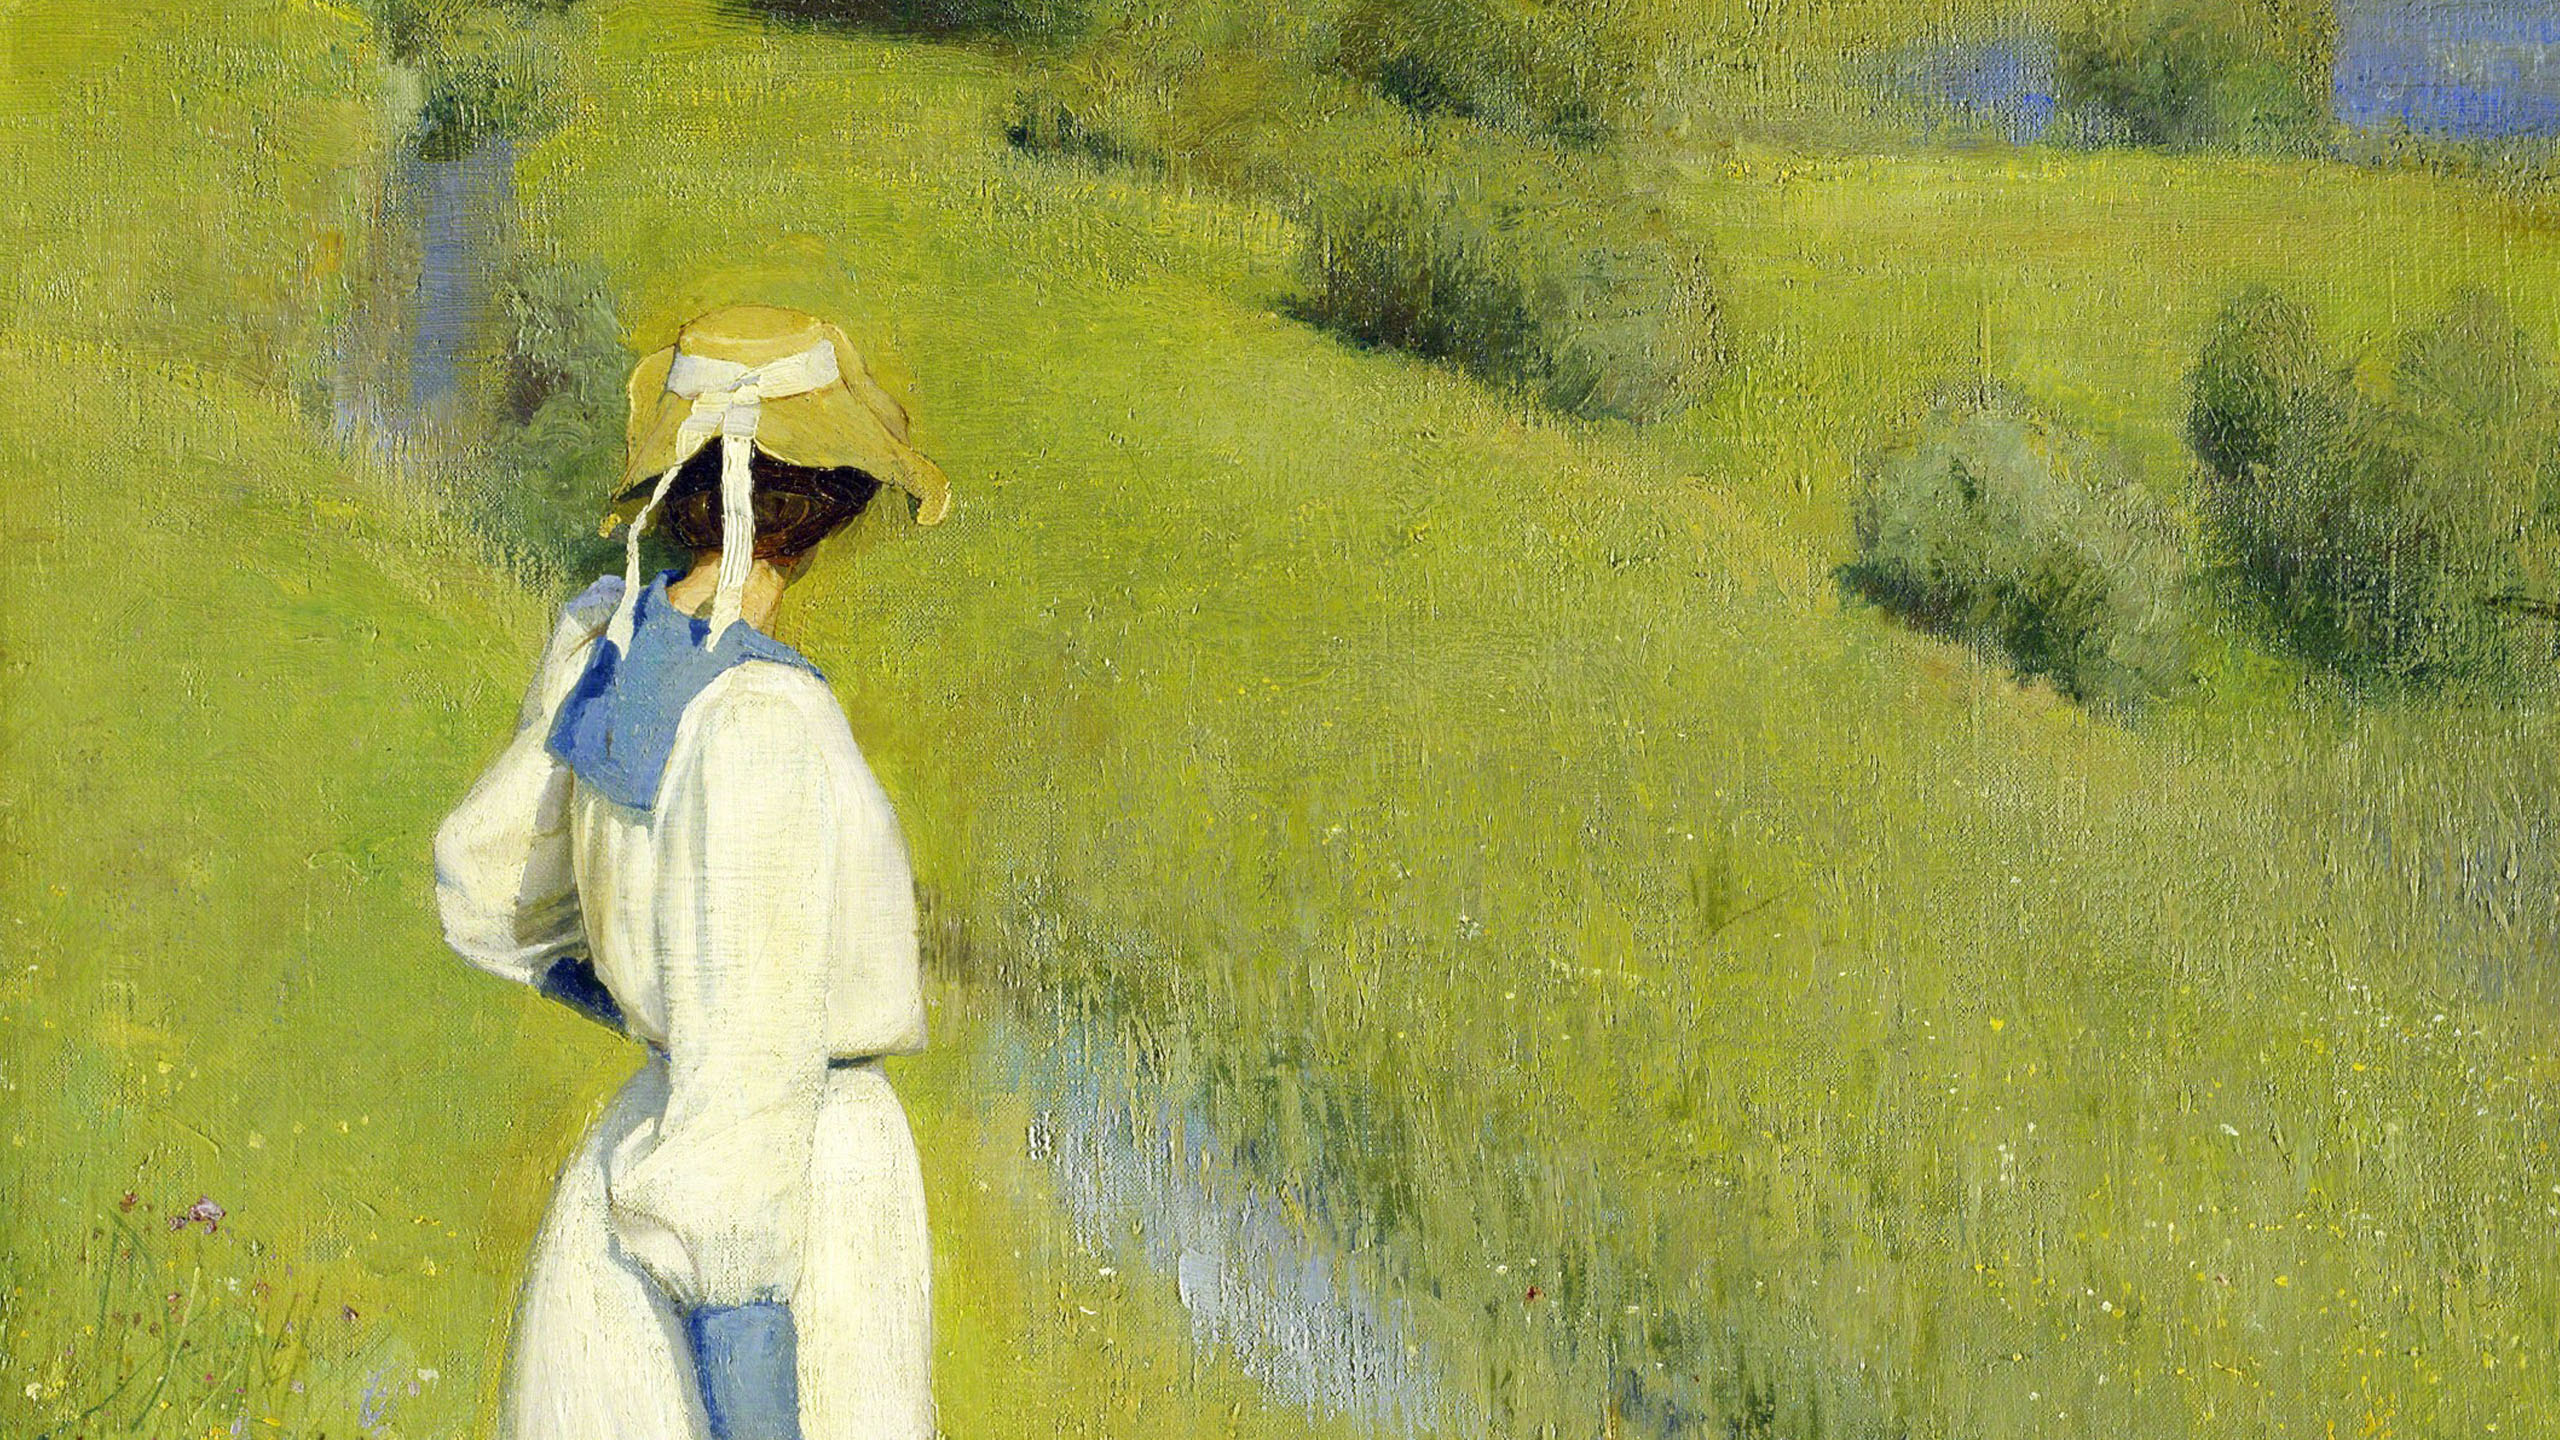 Richard Riemerschmid - In the Countryside 2560x1440